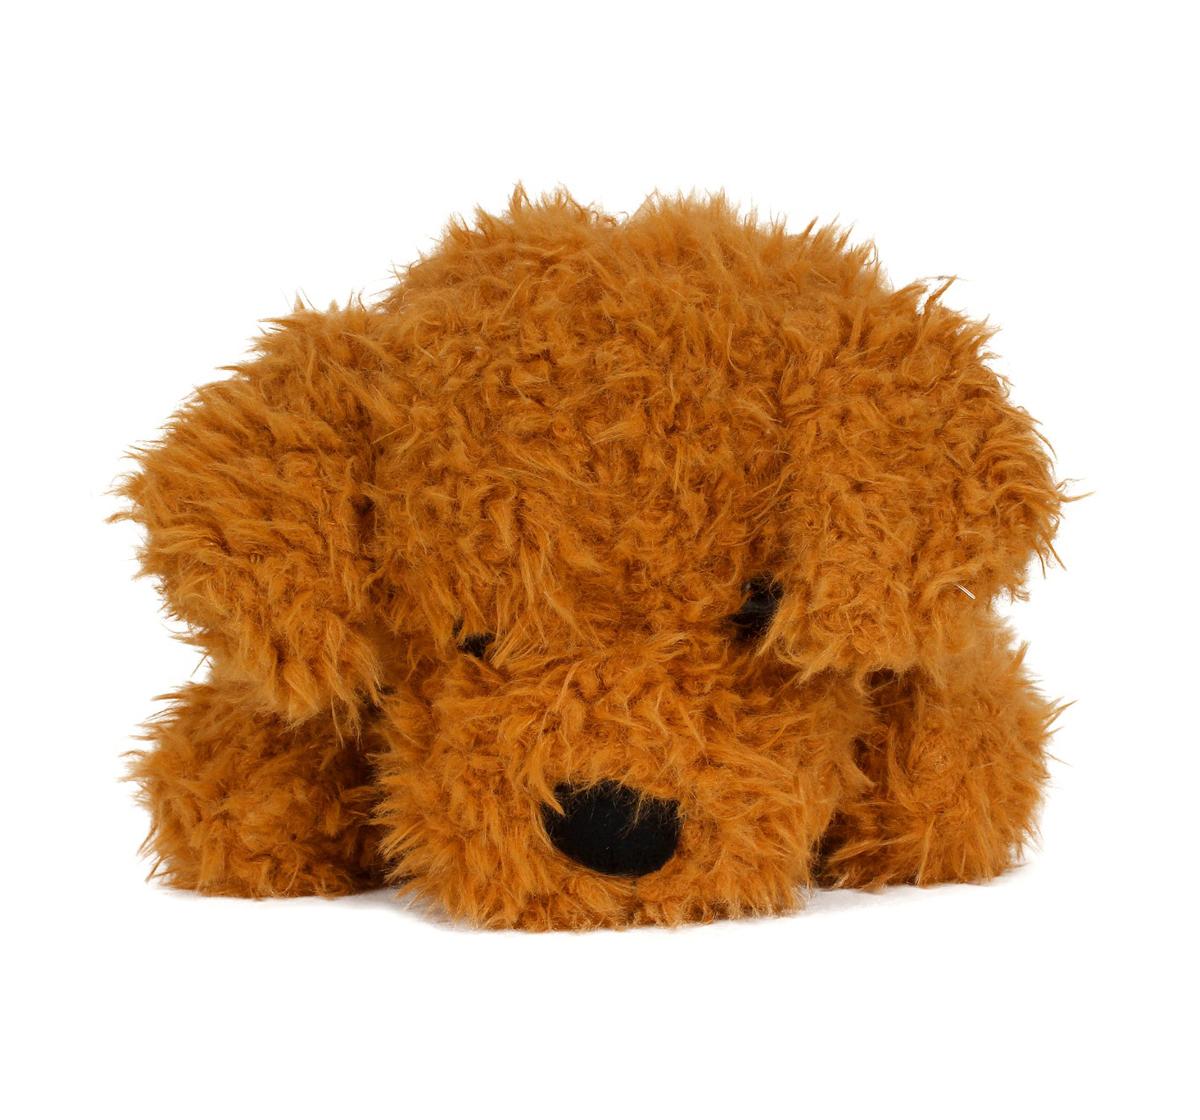 Fuzzbuzz | Fuzzbuzz Sitting Dog - Lt. Brown - 25Cm Quirky Soft Toys for Kids age 0M+ - 25 Cm (Light Brown)